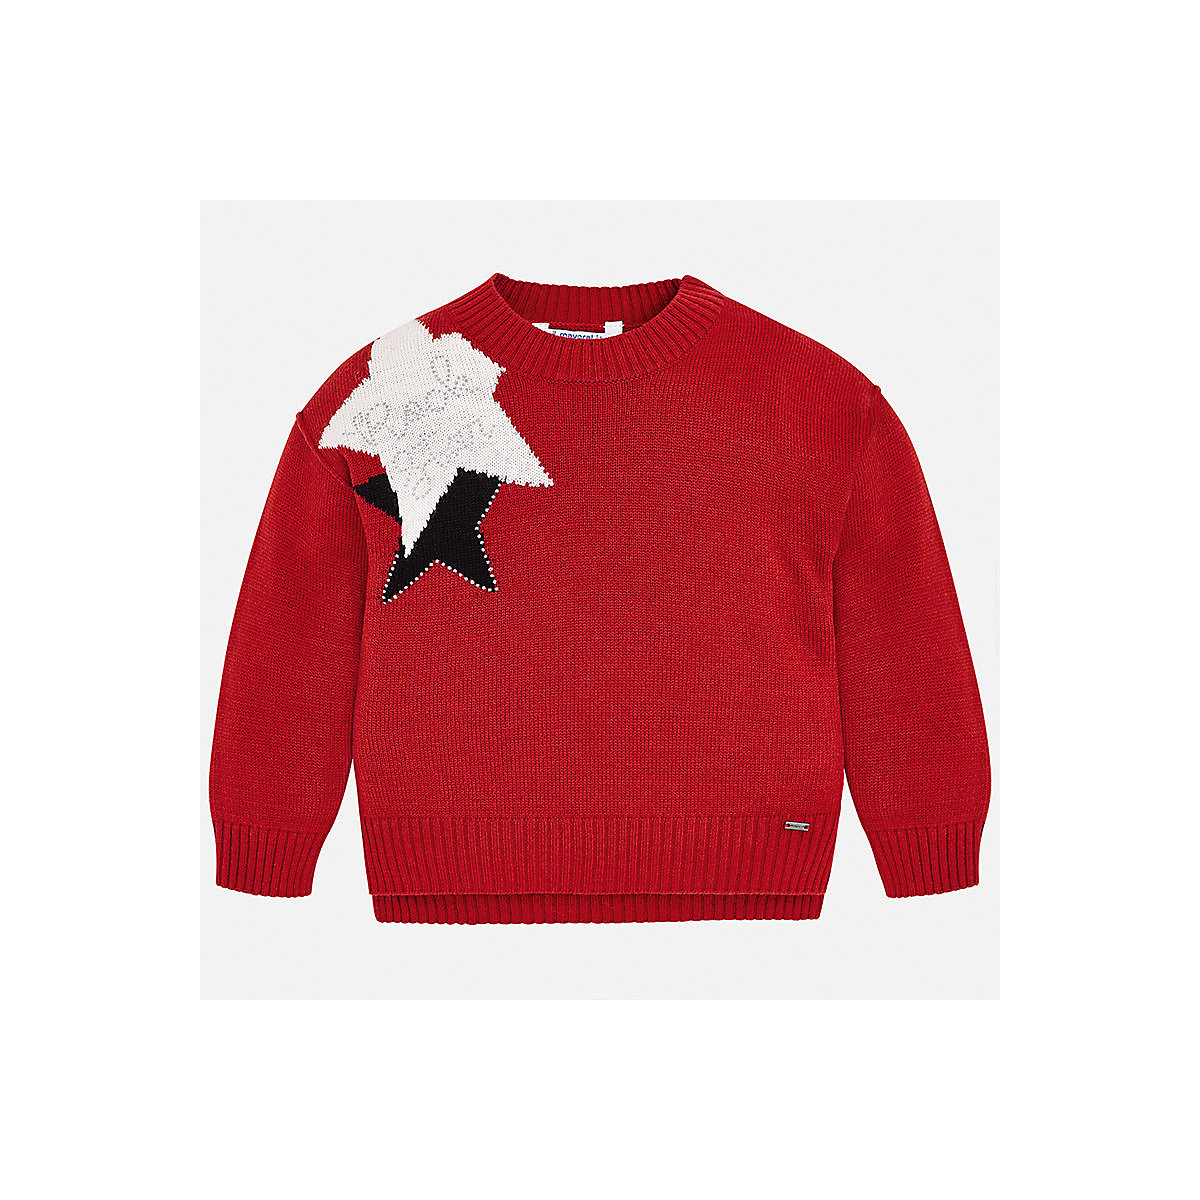 MAYORAL Sweaters 8850507 Girls Acrylic winter clothes baby wear boy children child wear